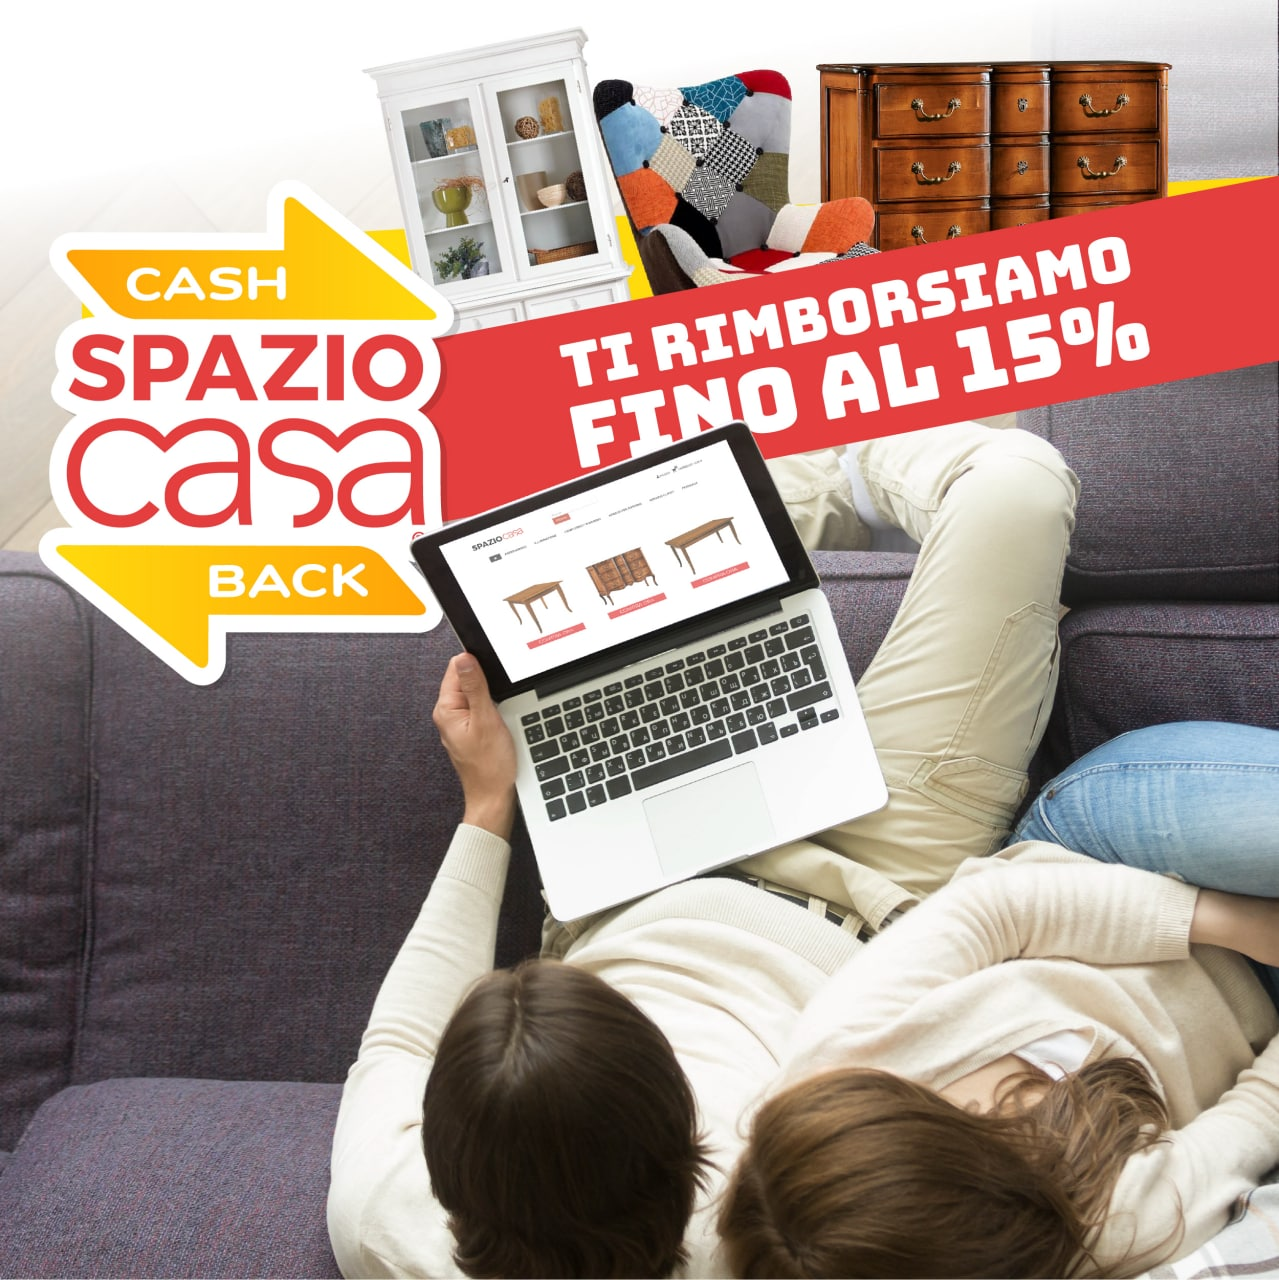 Cashback Spazio Casa